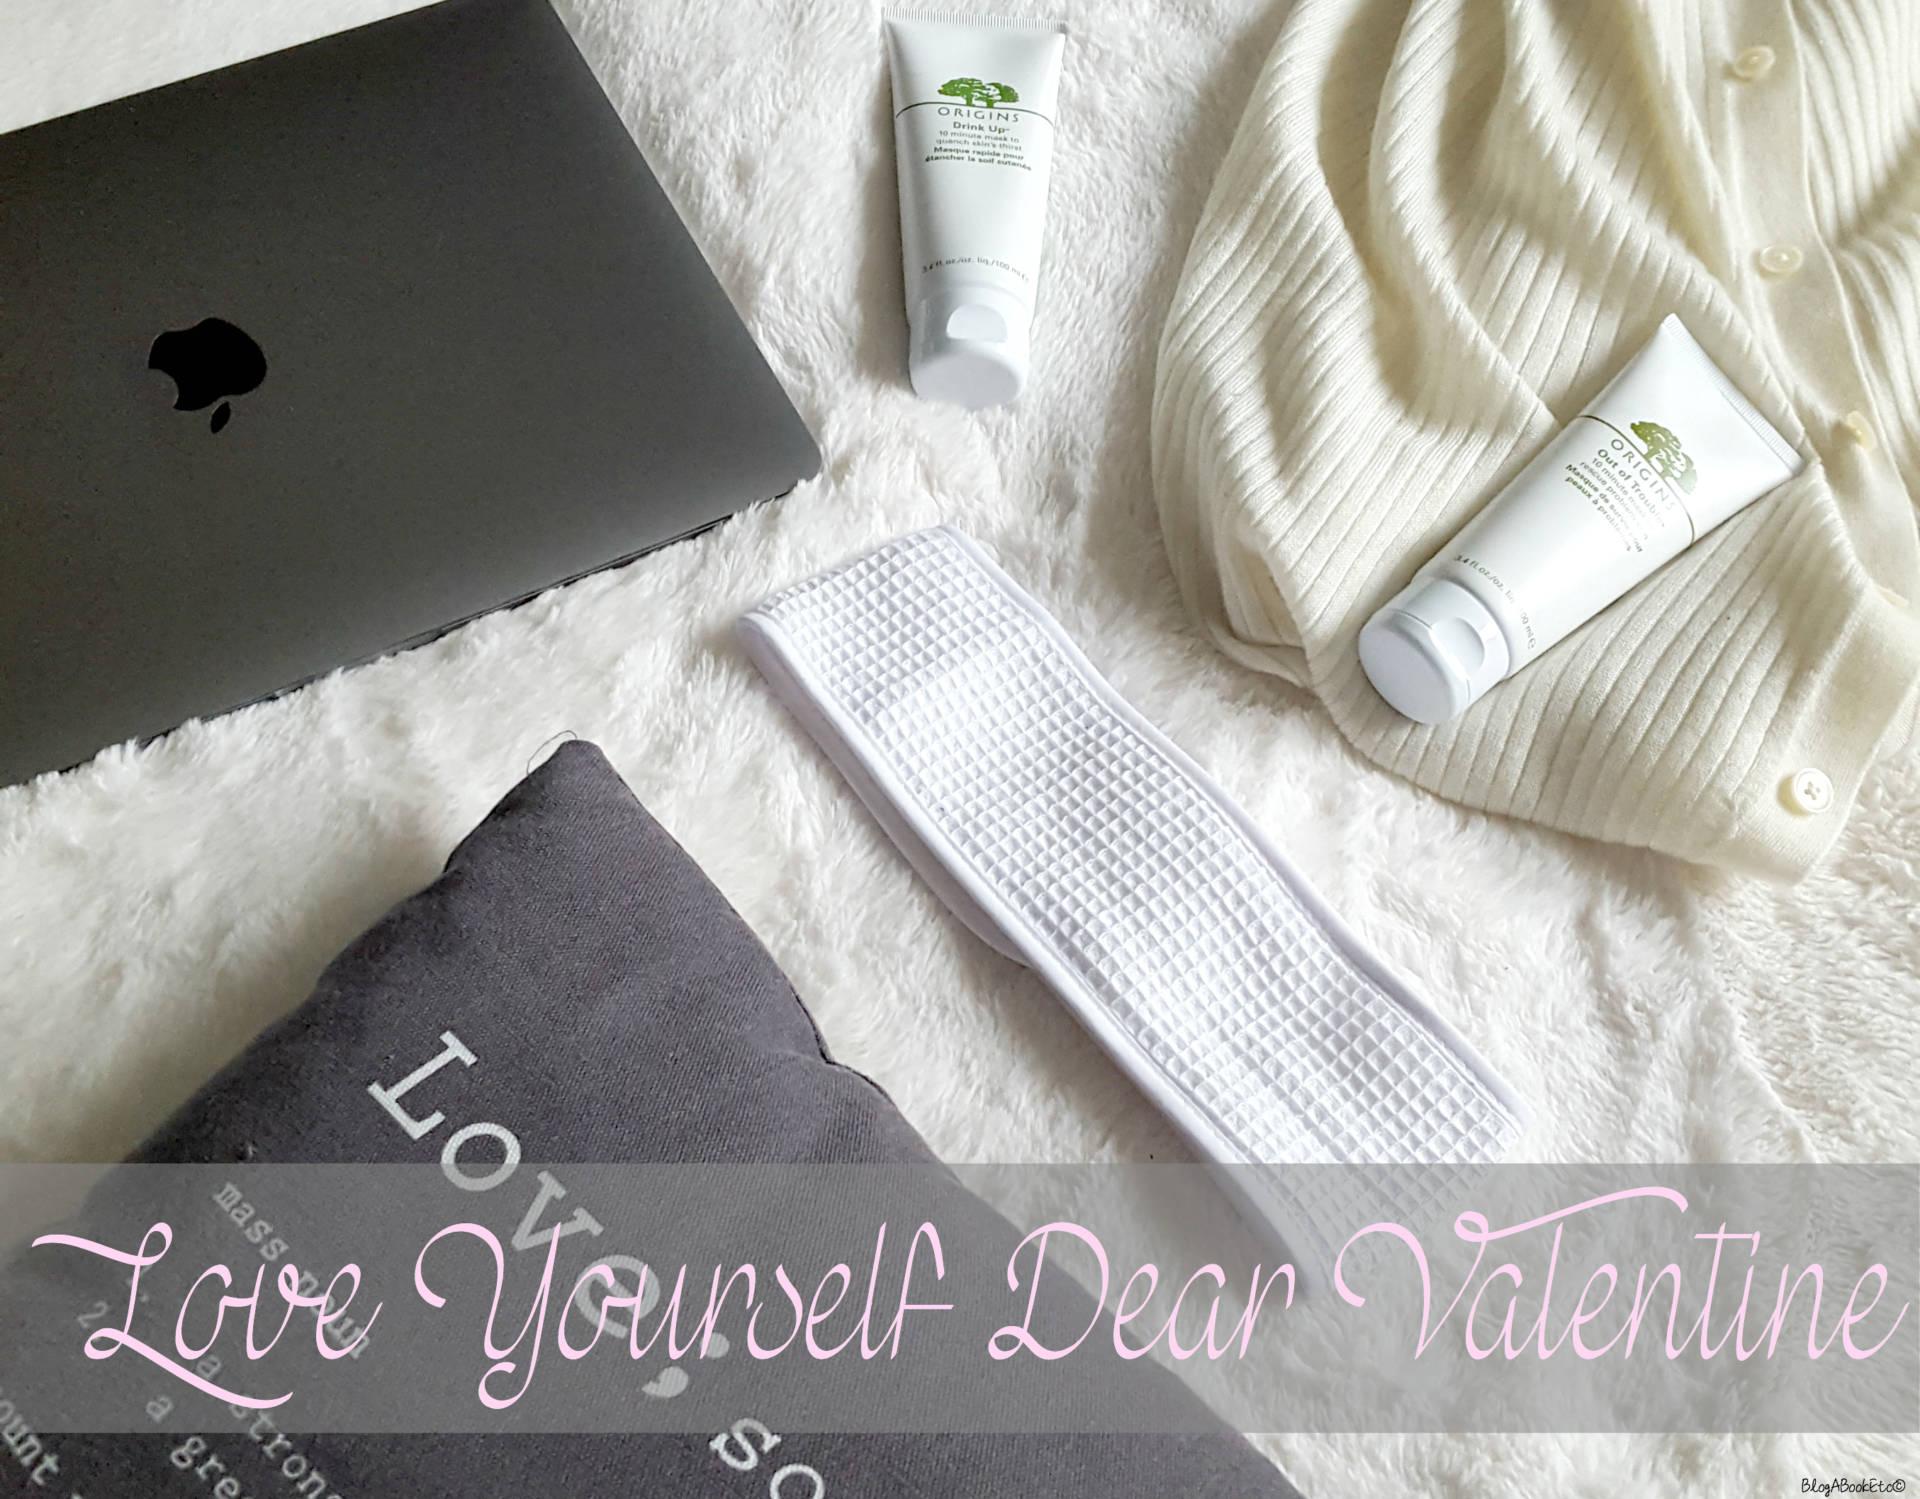 Love Yourself, Dear Valentine, Valentine's Day, Valentine, Romance, Love, Self Care, Self Love, Love Yourself, Apple, MacBook Pro, Origins, Skin Care, skincare, beauty, Blog A Book Etc, Fay